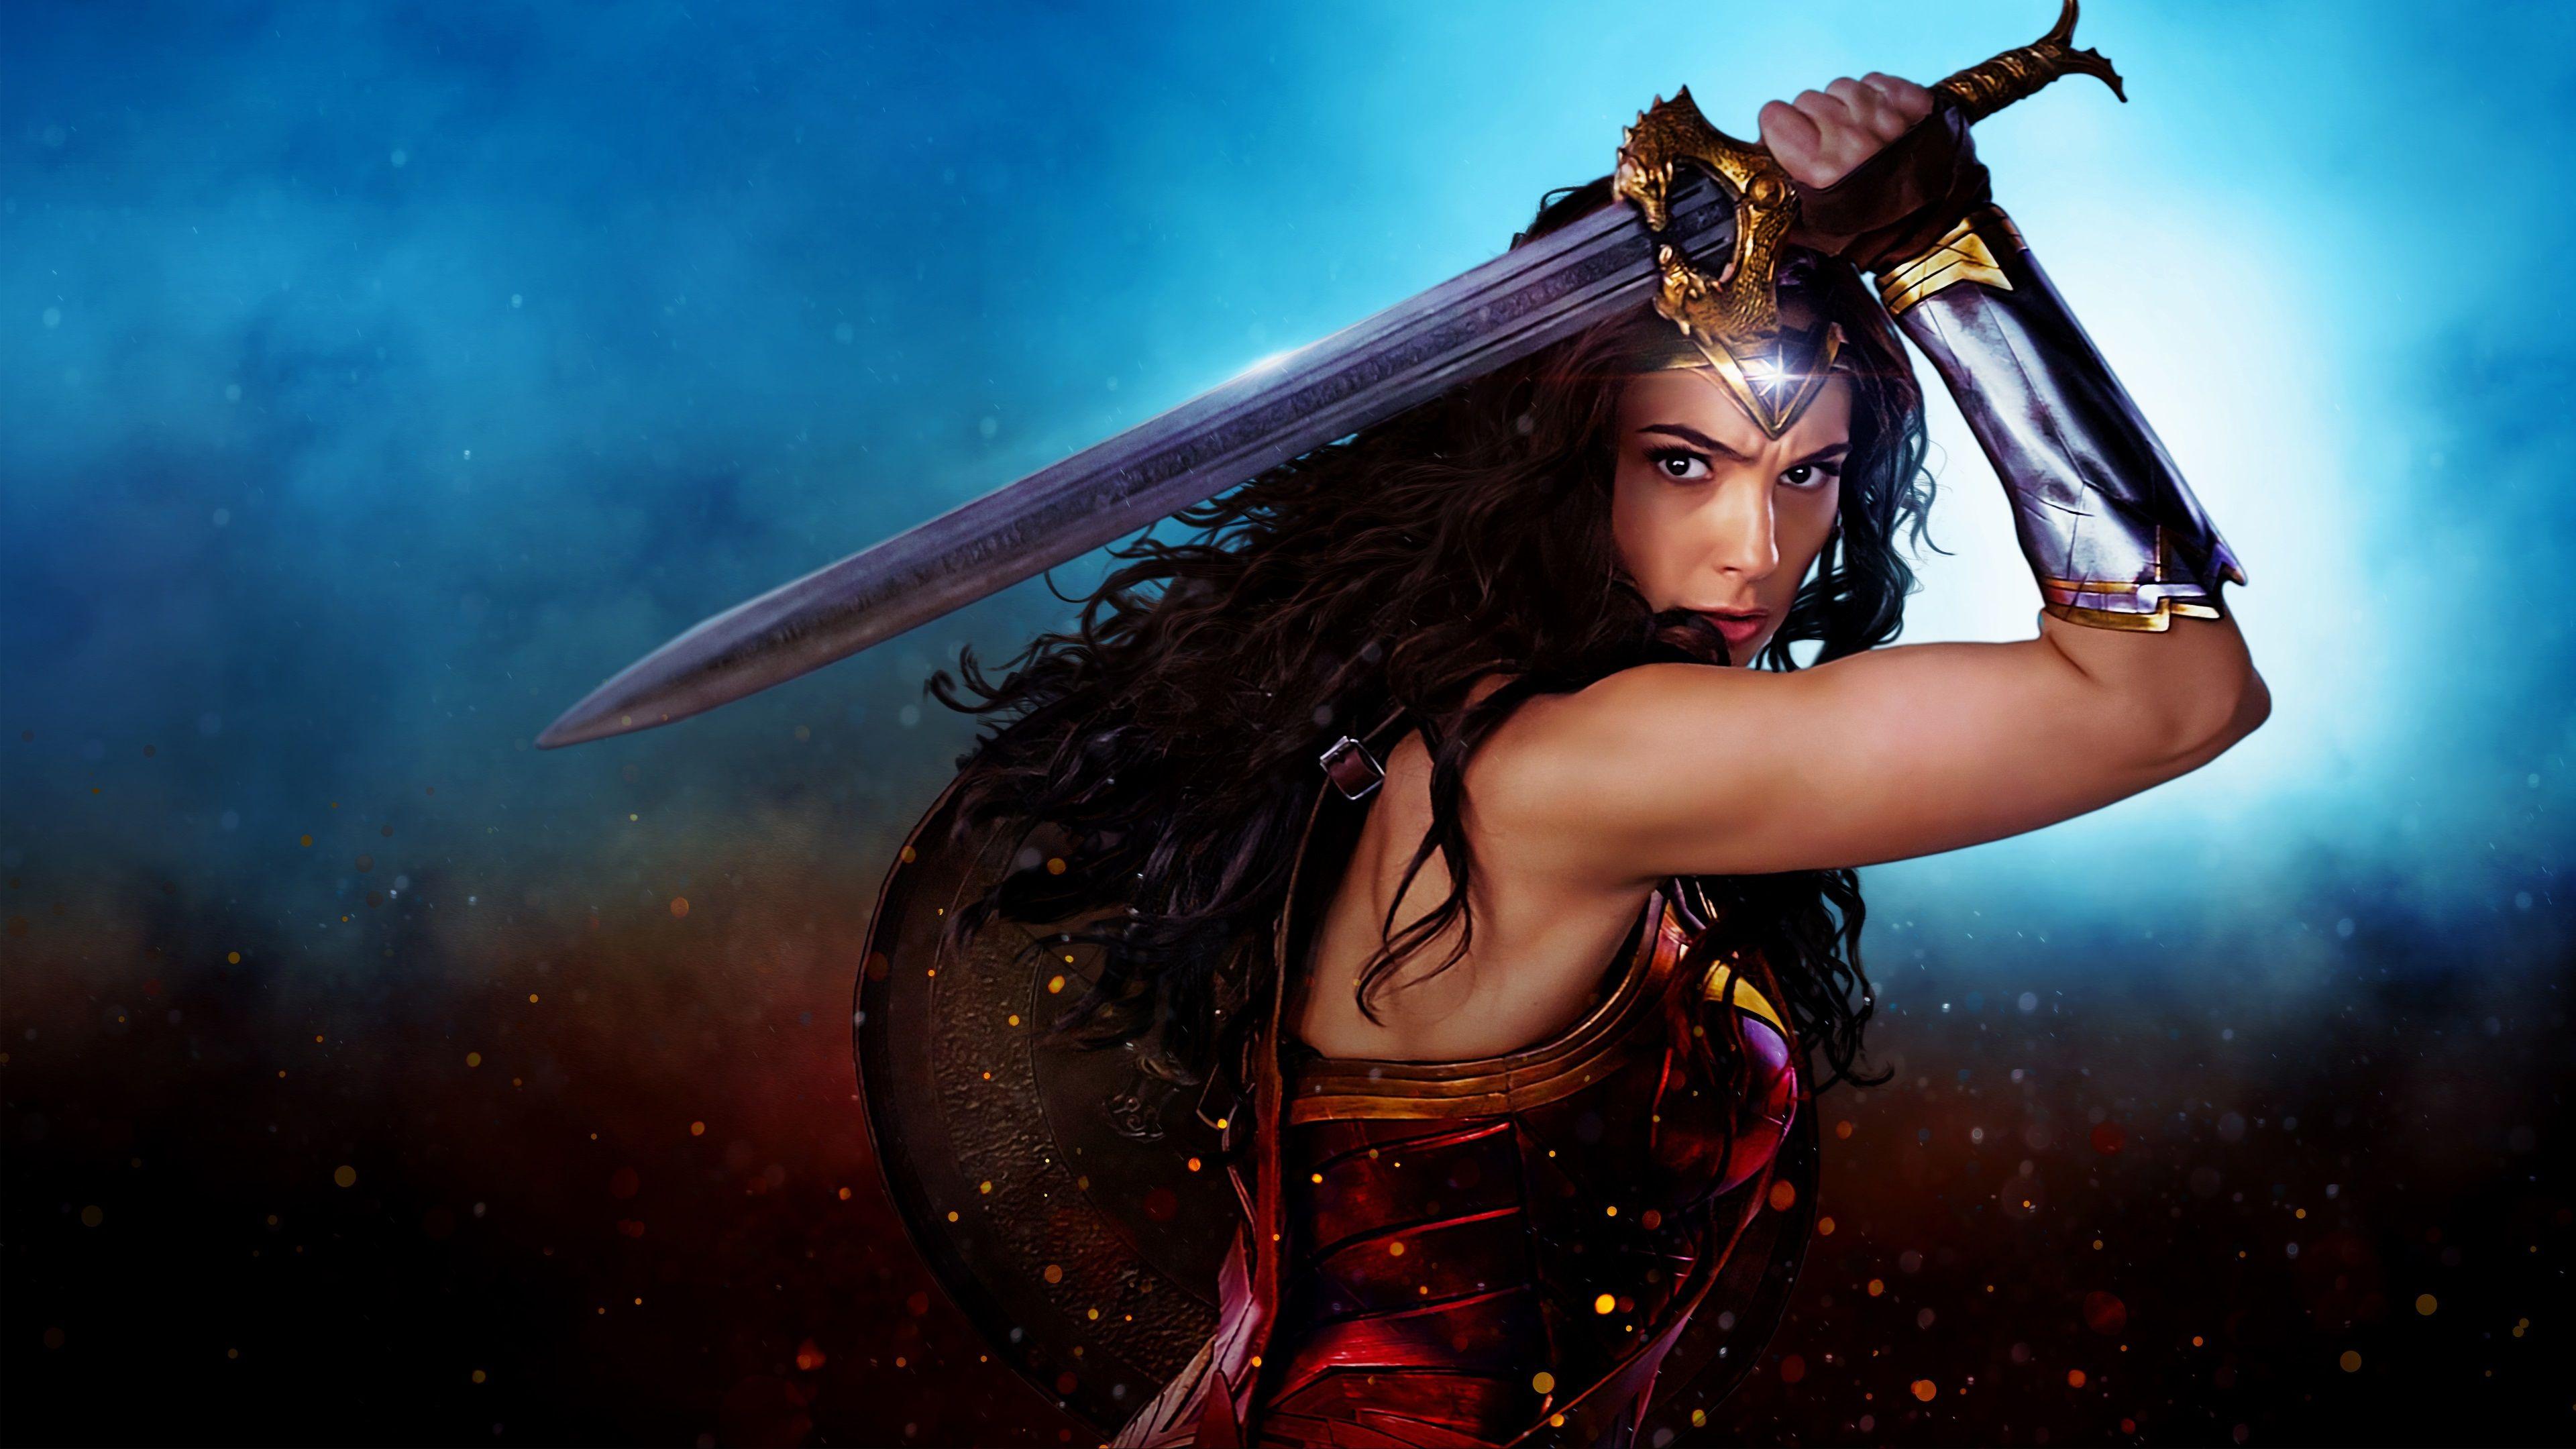 Wonder Woman Movie Uhd 4k Wallpaper: 3840x2160 Wonder Woman 4k Desktop Wallpaper High